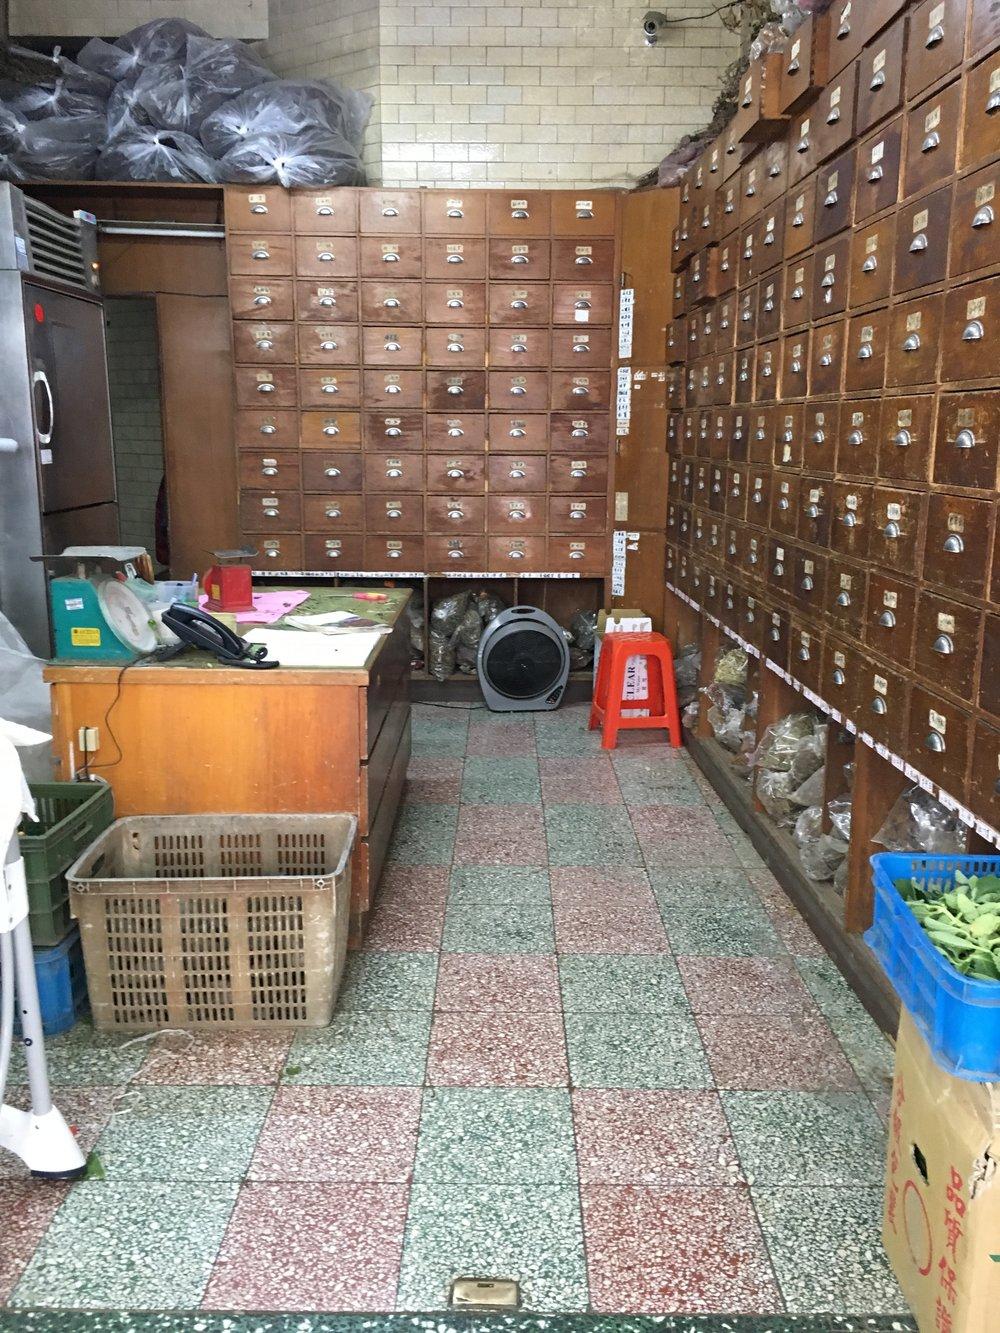 Herb cabinet